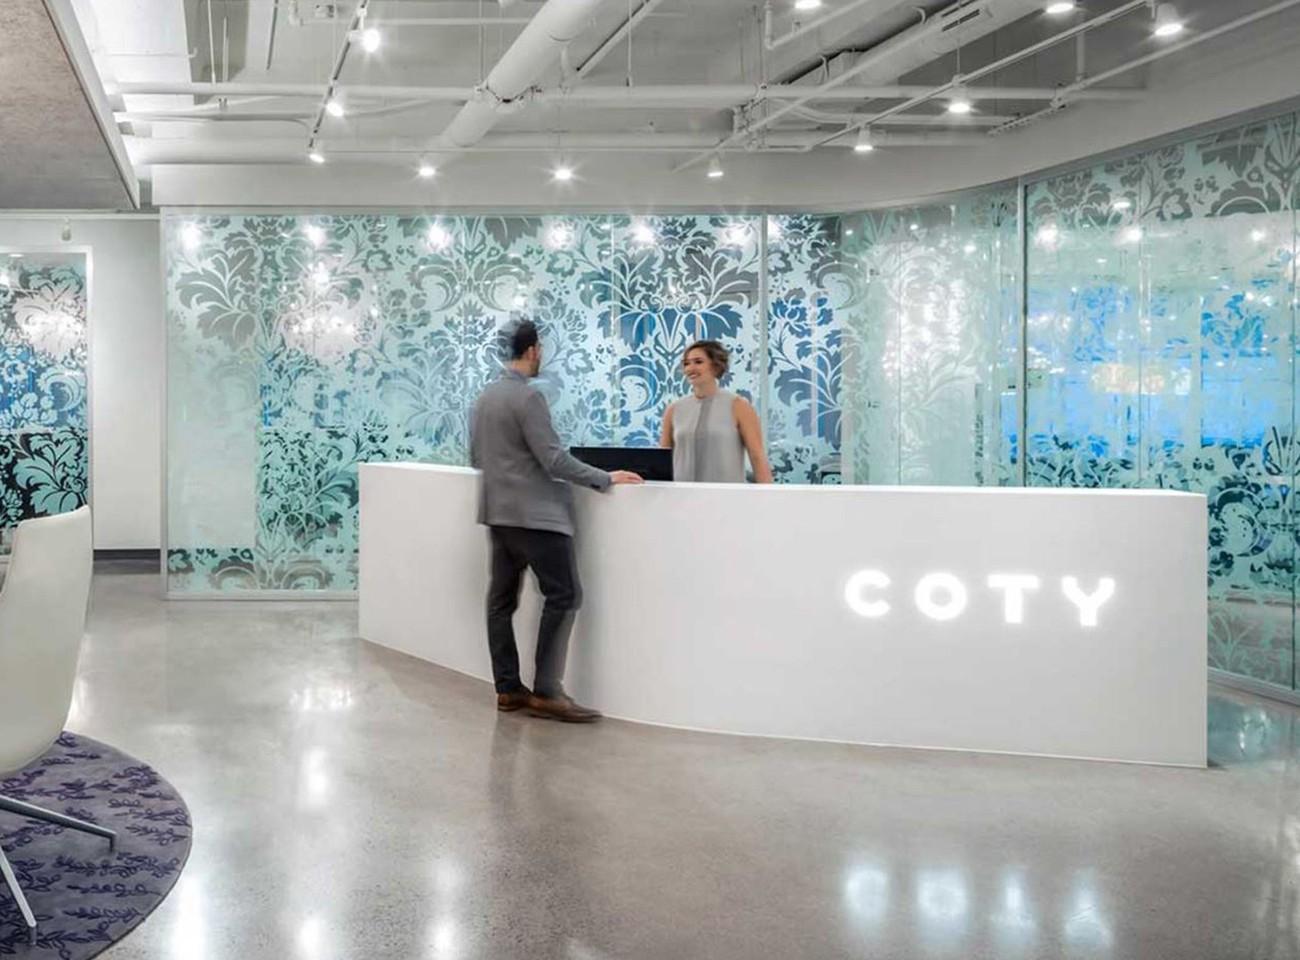 Coty Careers